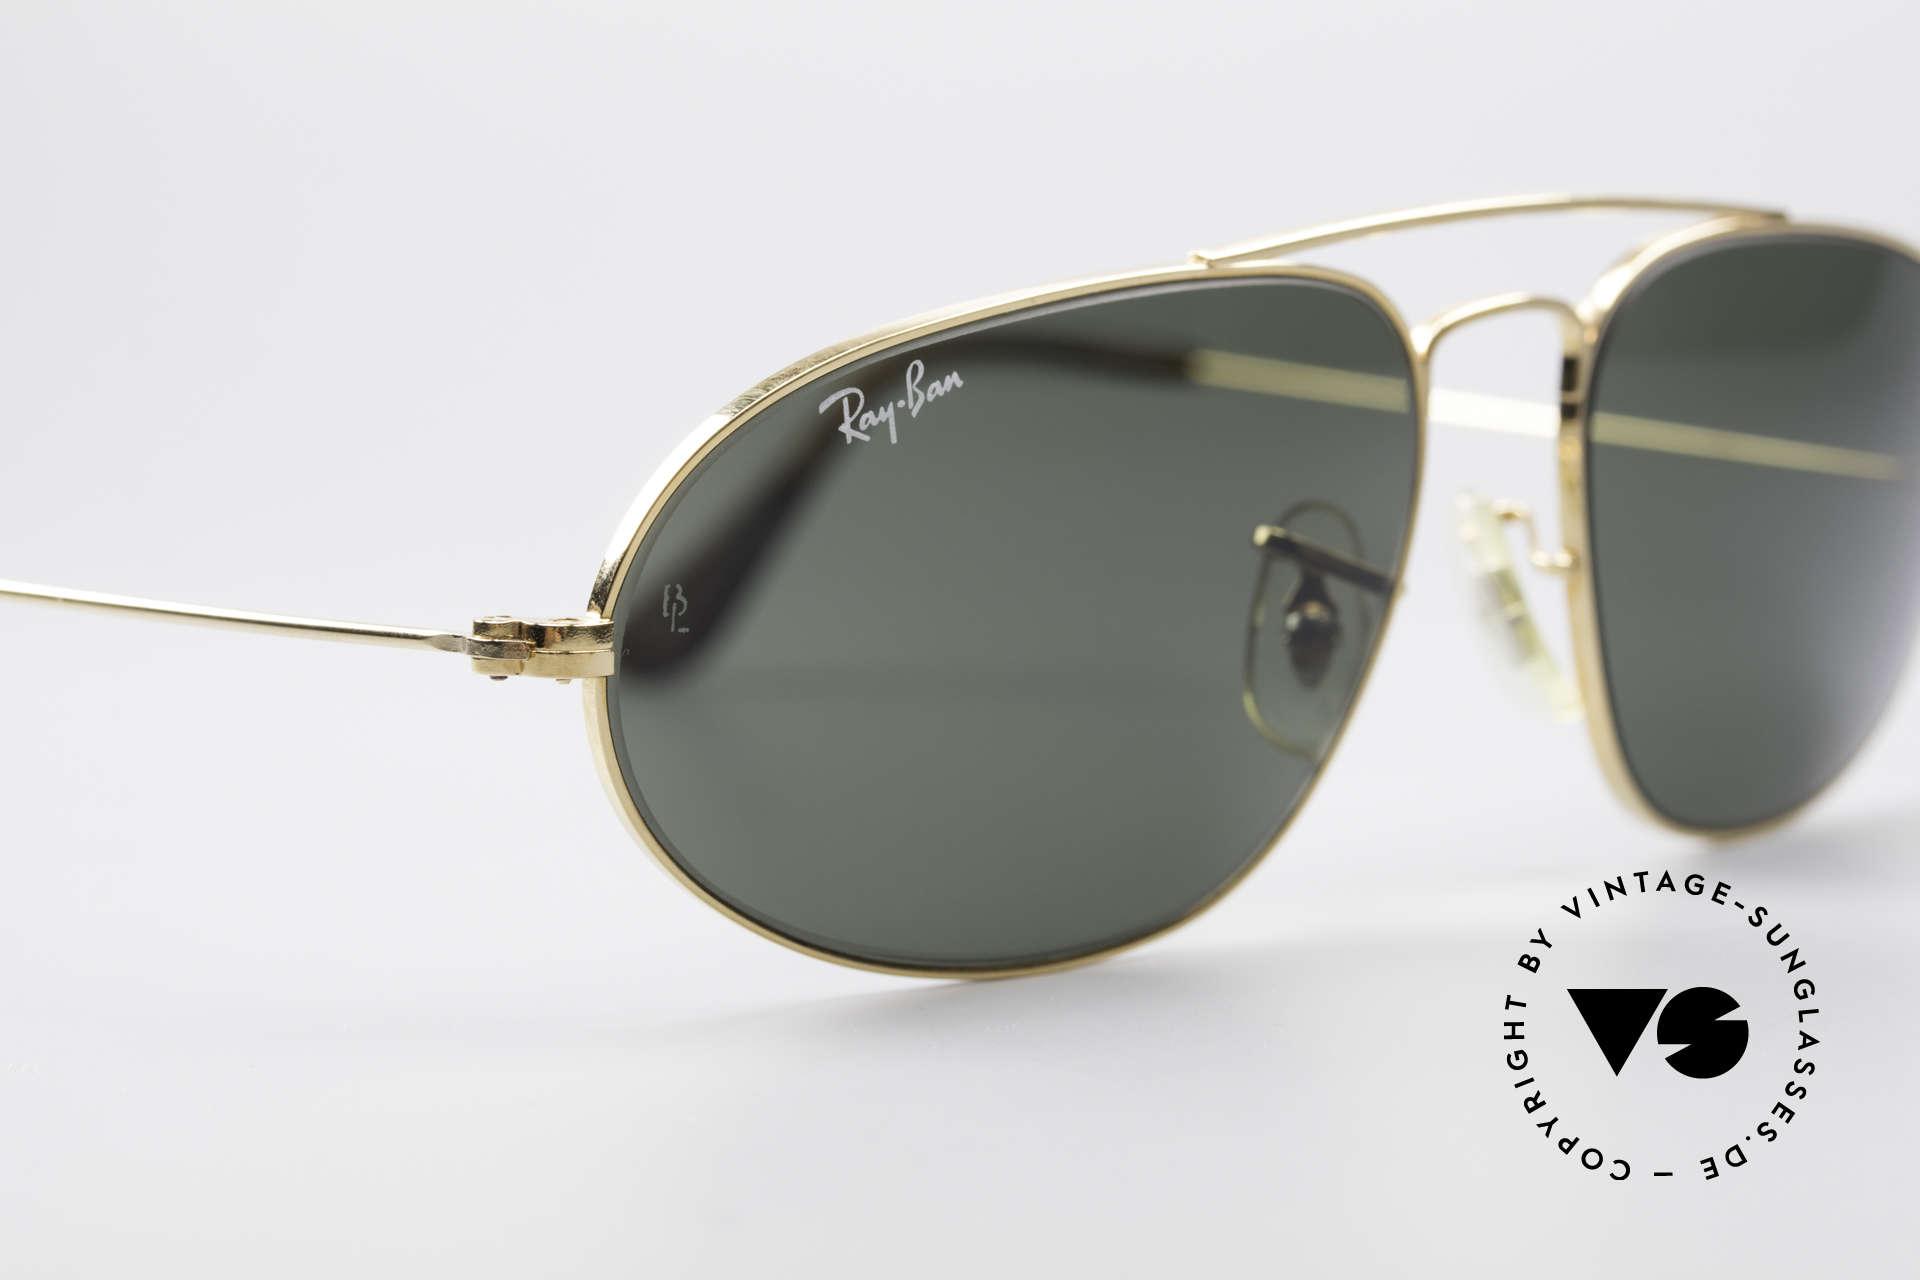 Ray Ban Fashion Metal 5 Extraordinary Aviator Shades, name: Fashion Metals 5, W1597, G-15, 58-16, Made for Men